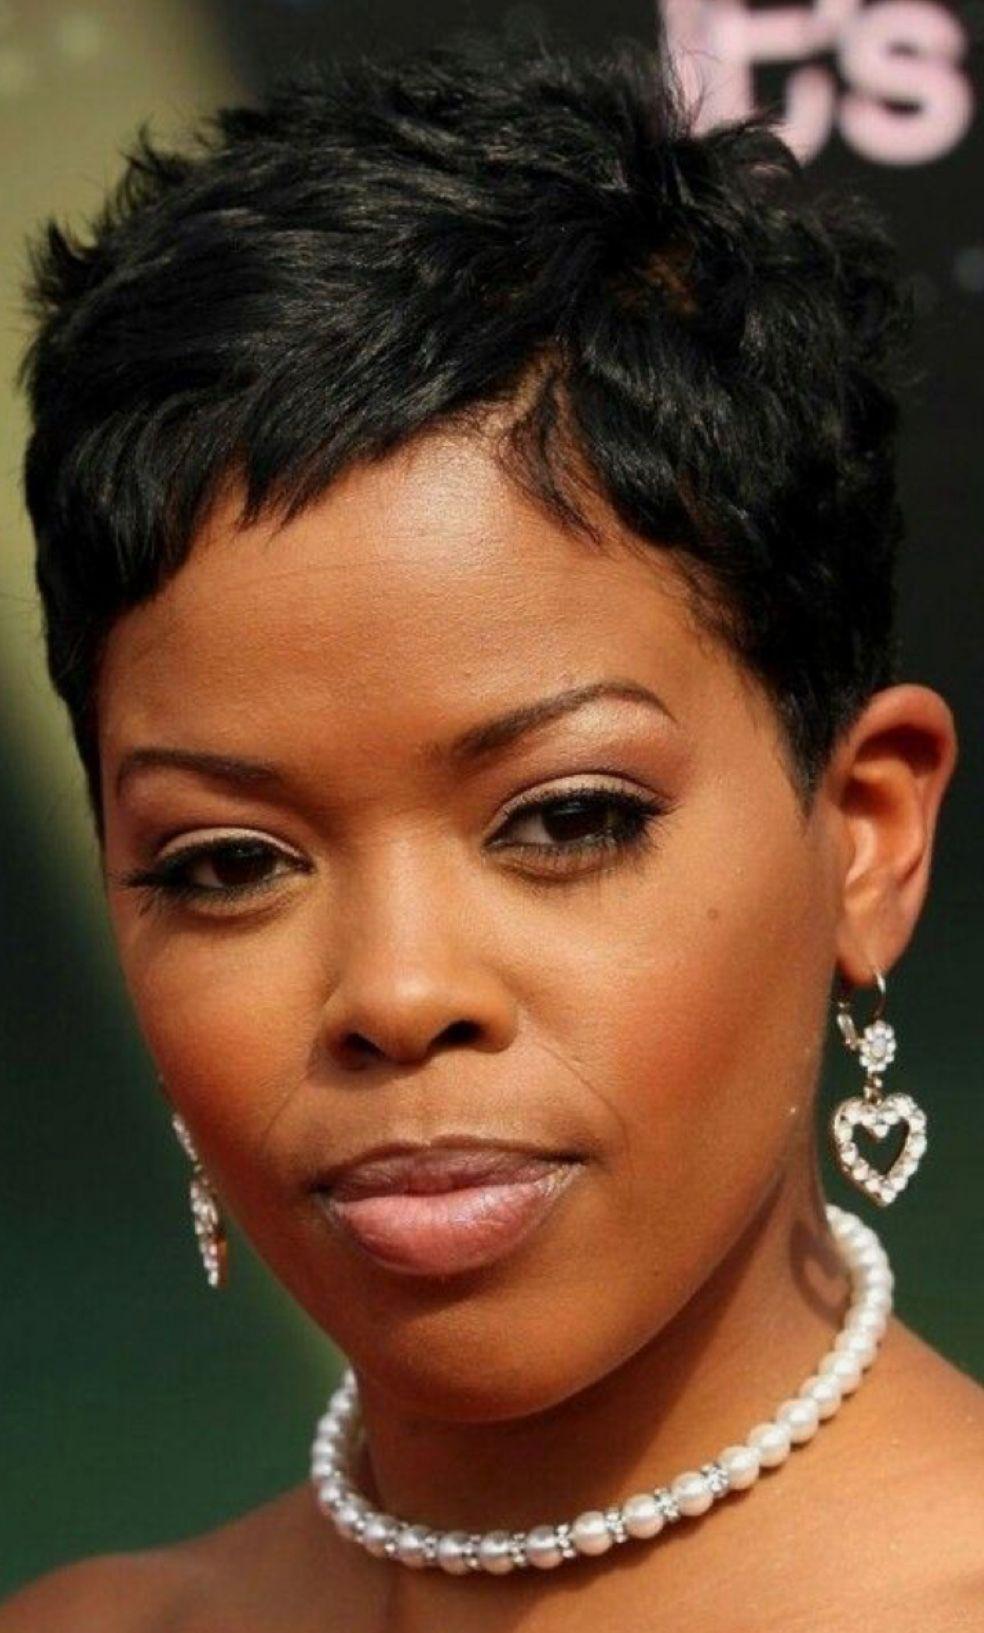 Edi blackhairstyles black hairstyles in pinterest short